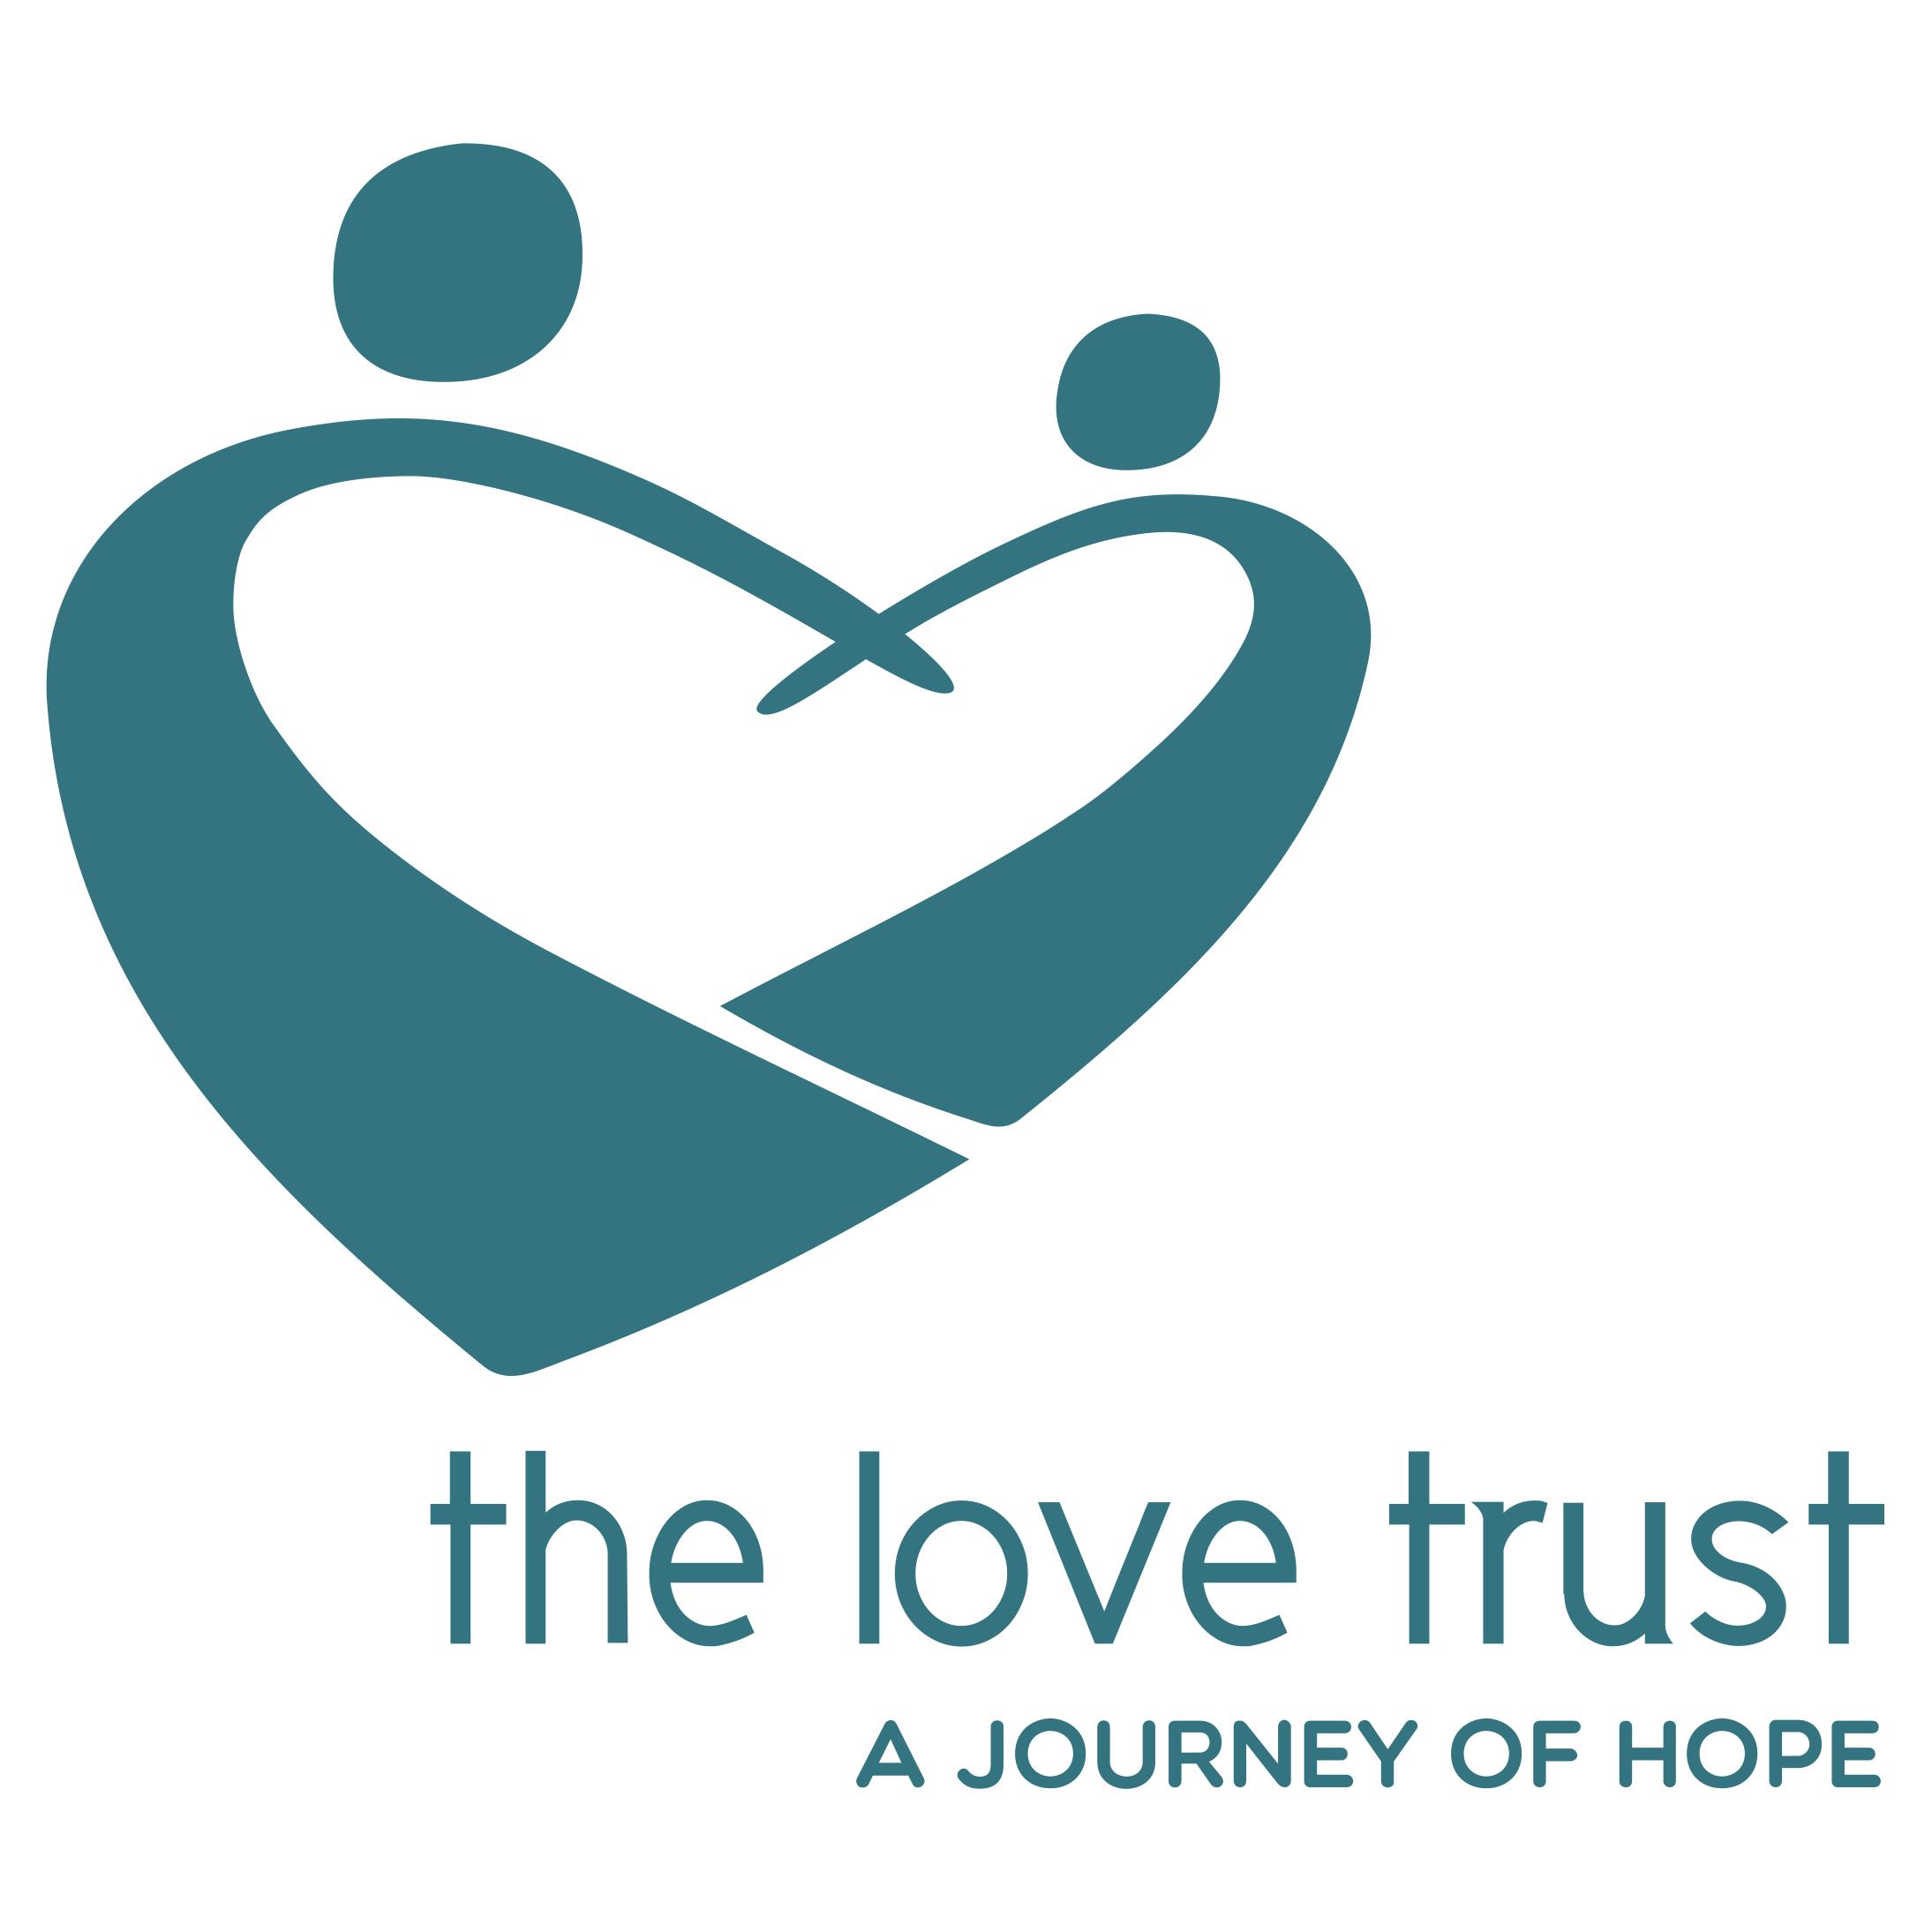 Love-Trust-Logo-teal.jpg